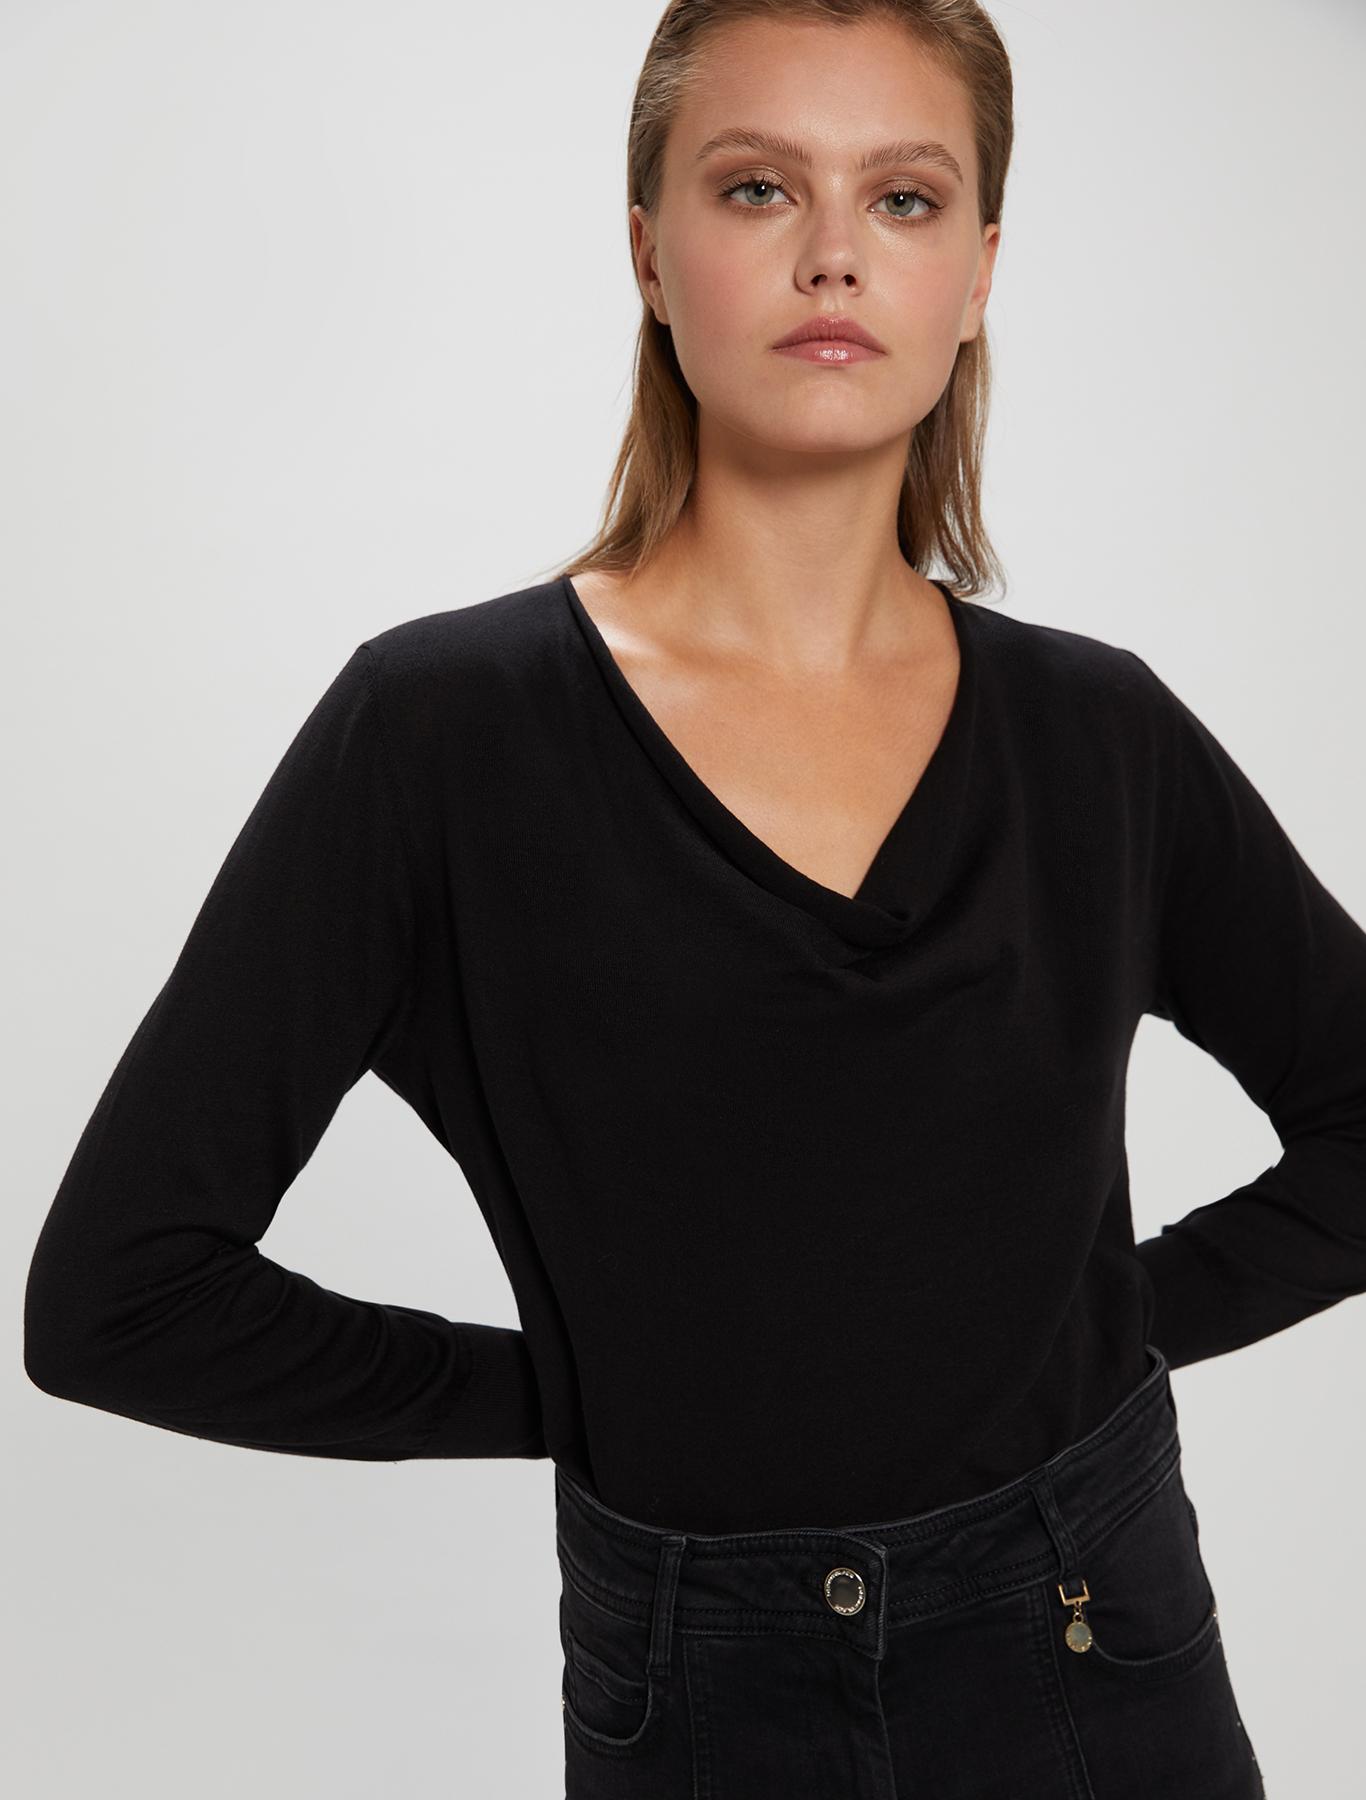 Cotton and silk jumper - black - pennyblack